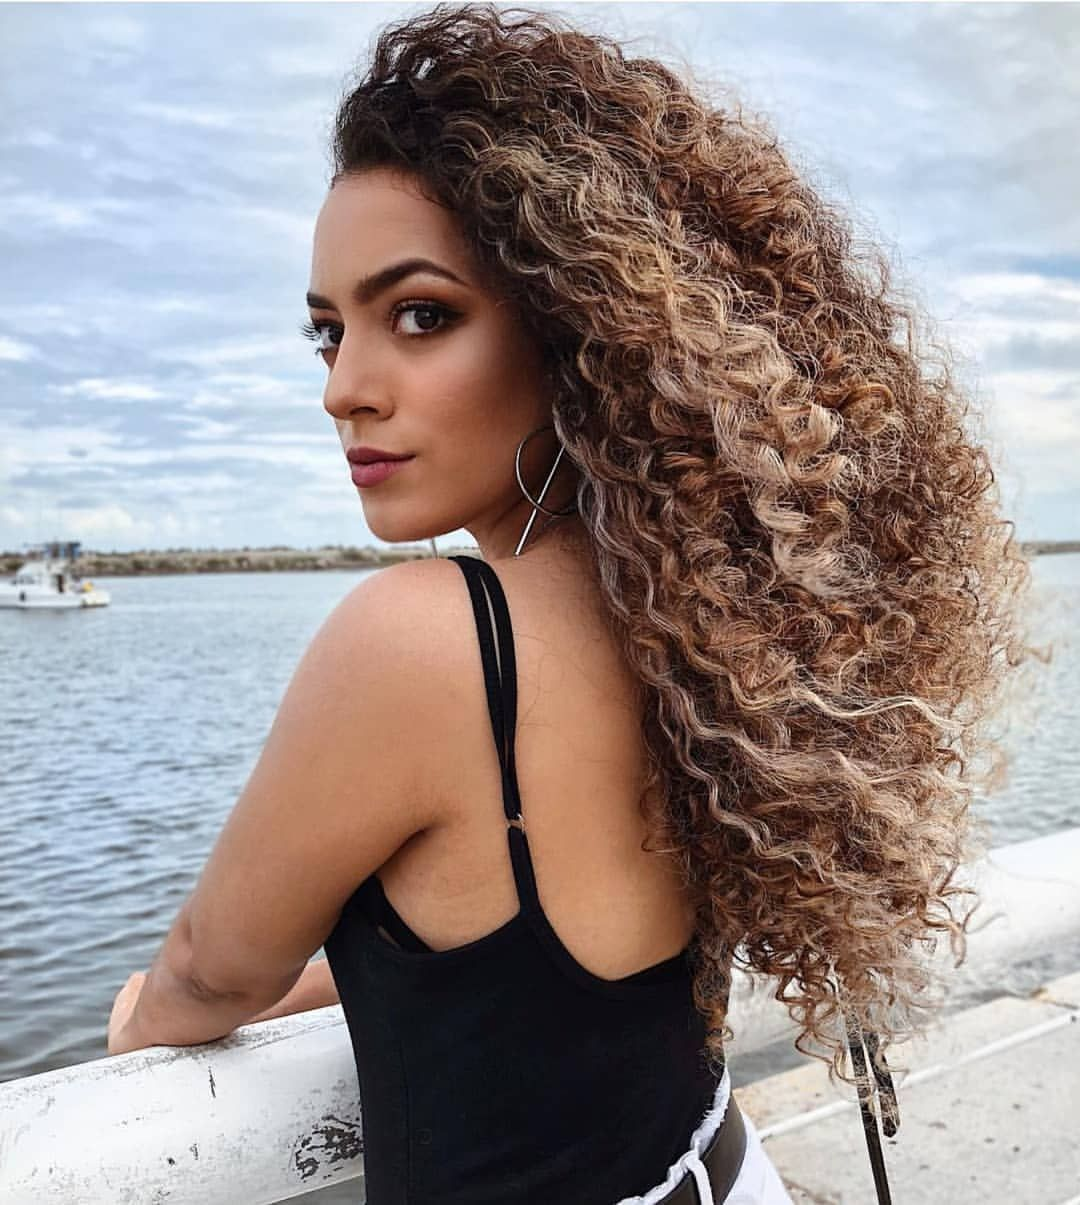 Frisuren Lange Haare 2020 Lockig